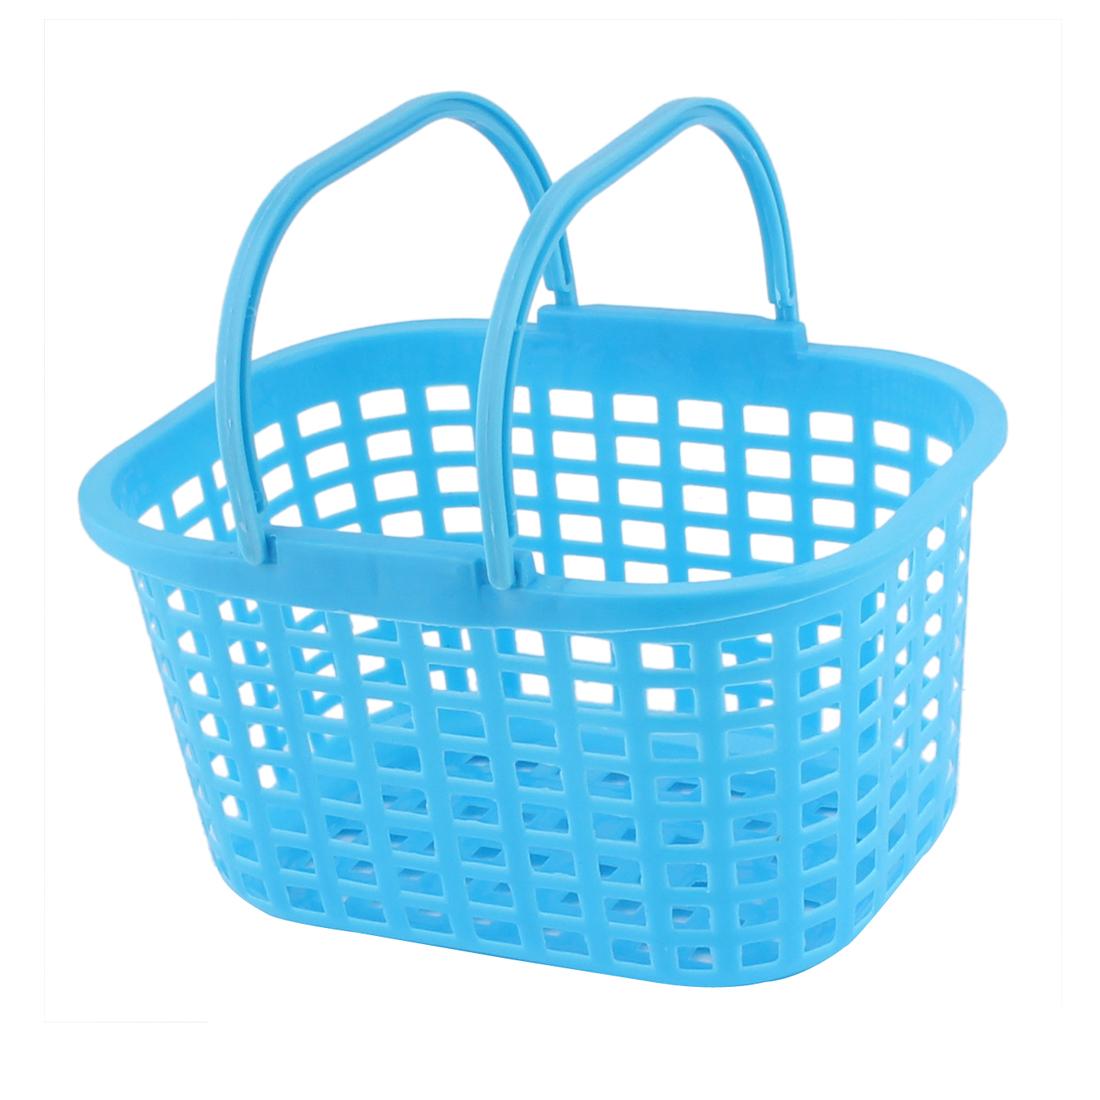 Household Washroom Bathroom Plastic Rectangle Design Portable Storage Basket Blue